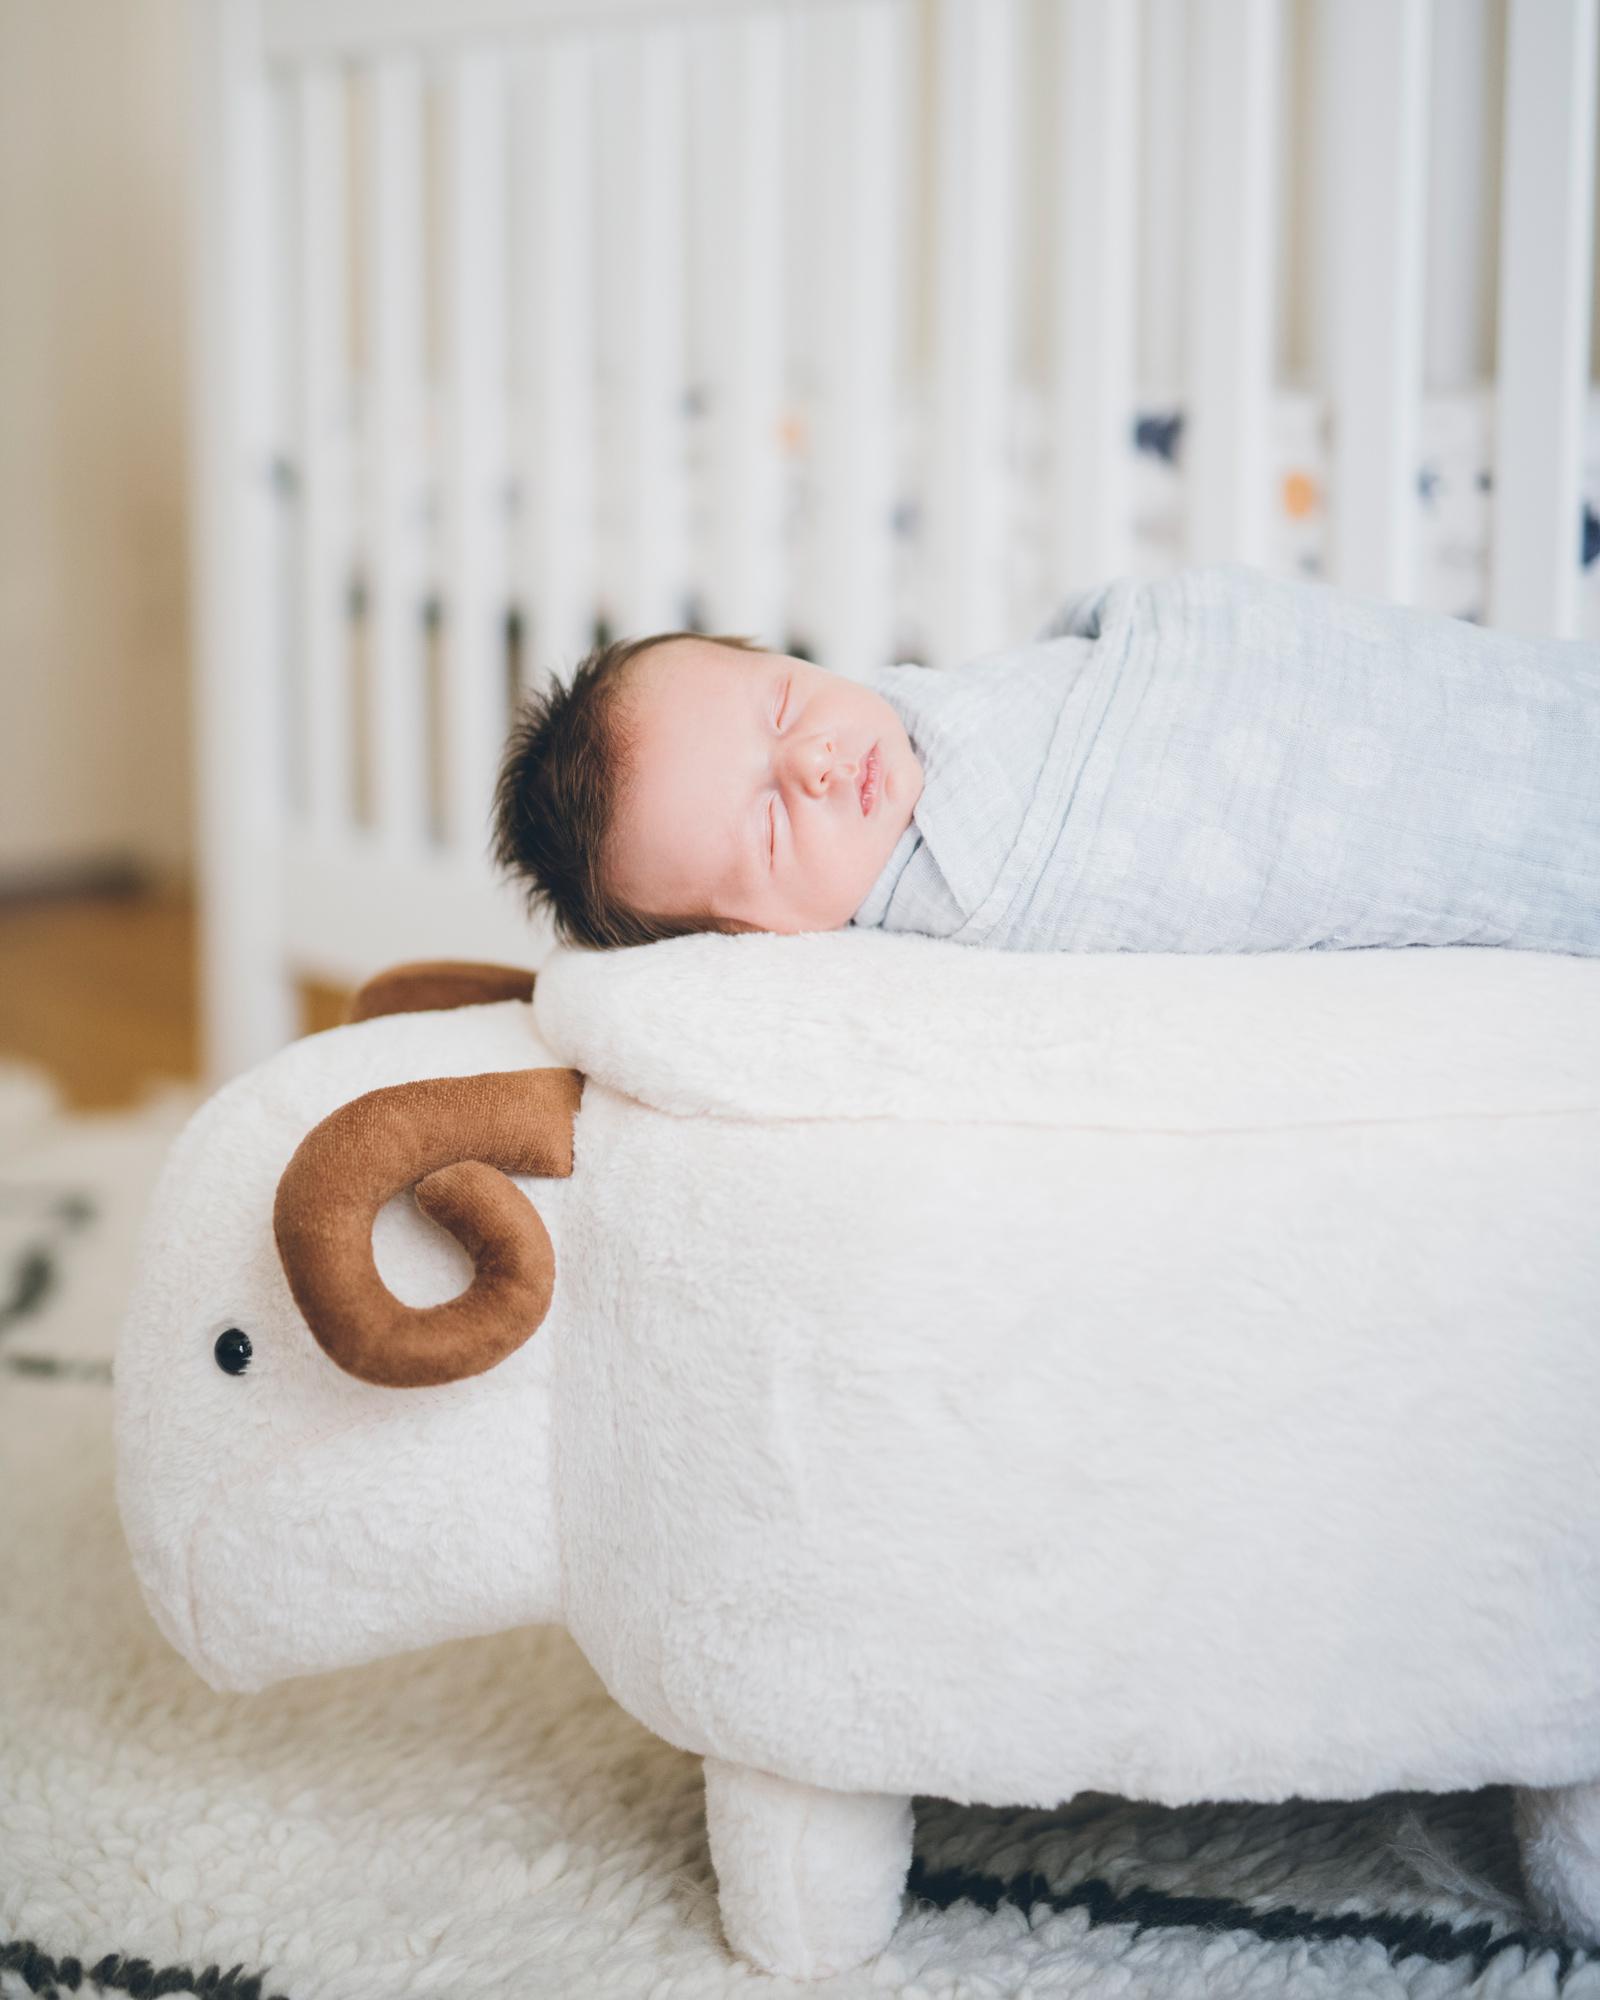 newborn-baby-boy-sleeping-on-the-sheep.jpg